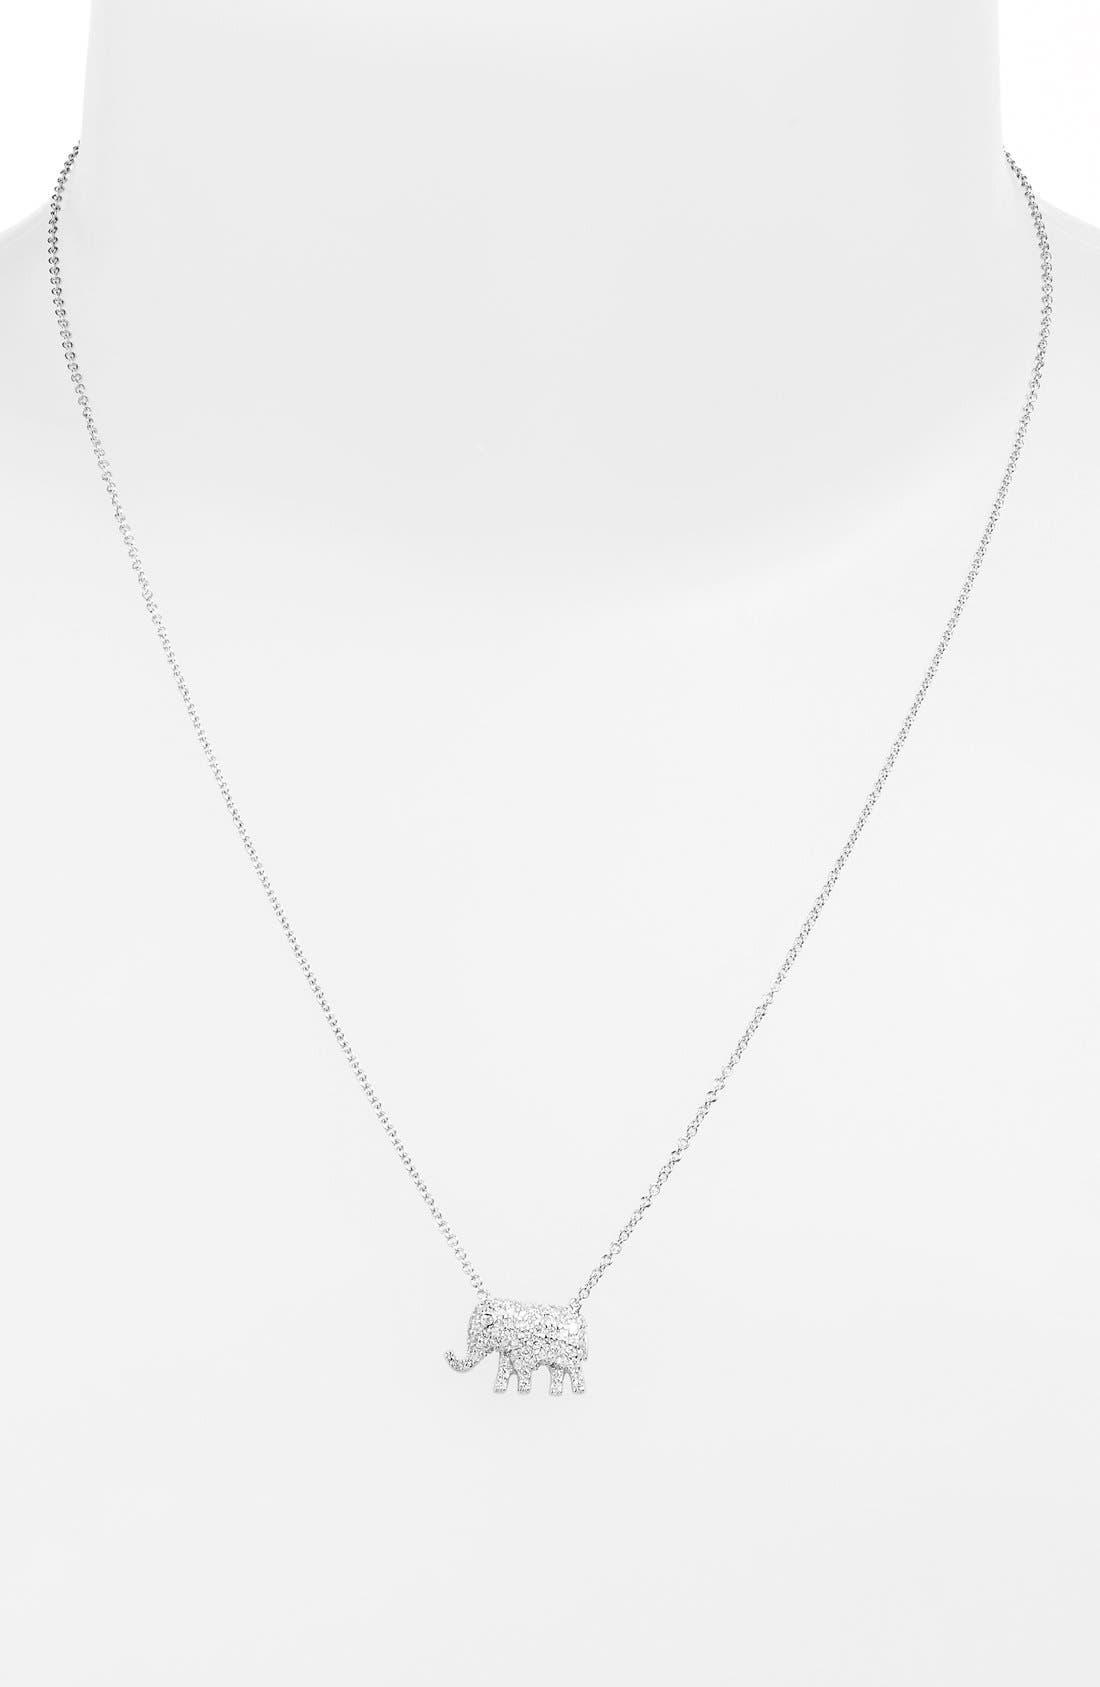 Alternate Image 1 Selected - Sugar Bean Jewelry Pavé Elephant Pendant Necklace